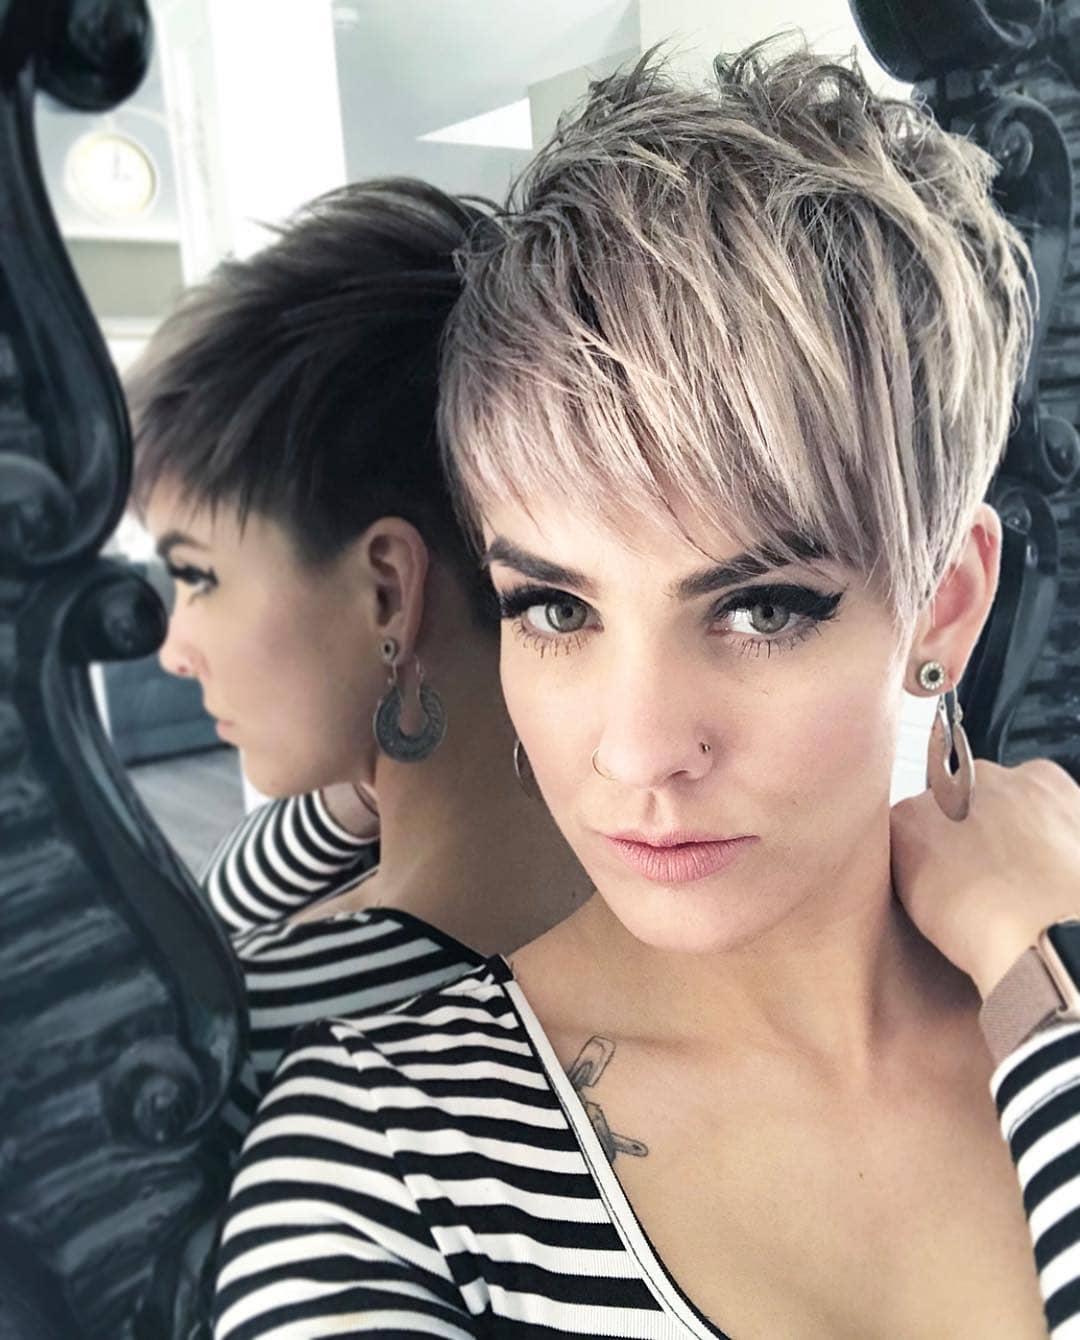 Best Stylish Pixie Hair Cut Ideas For Women Short Hairdo 2018 2019 Popular Haircuts